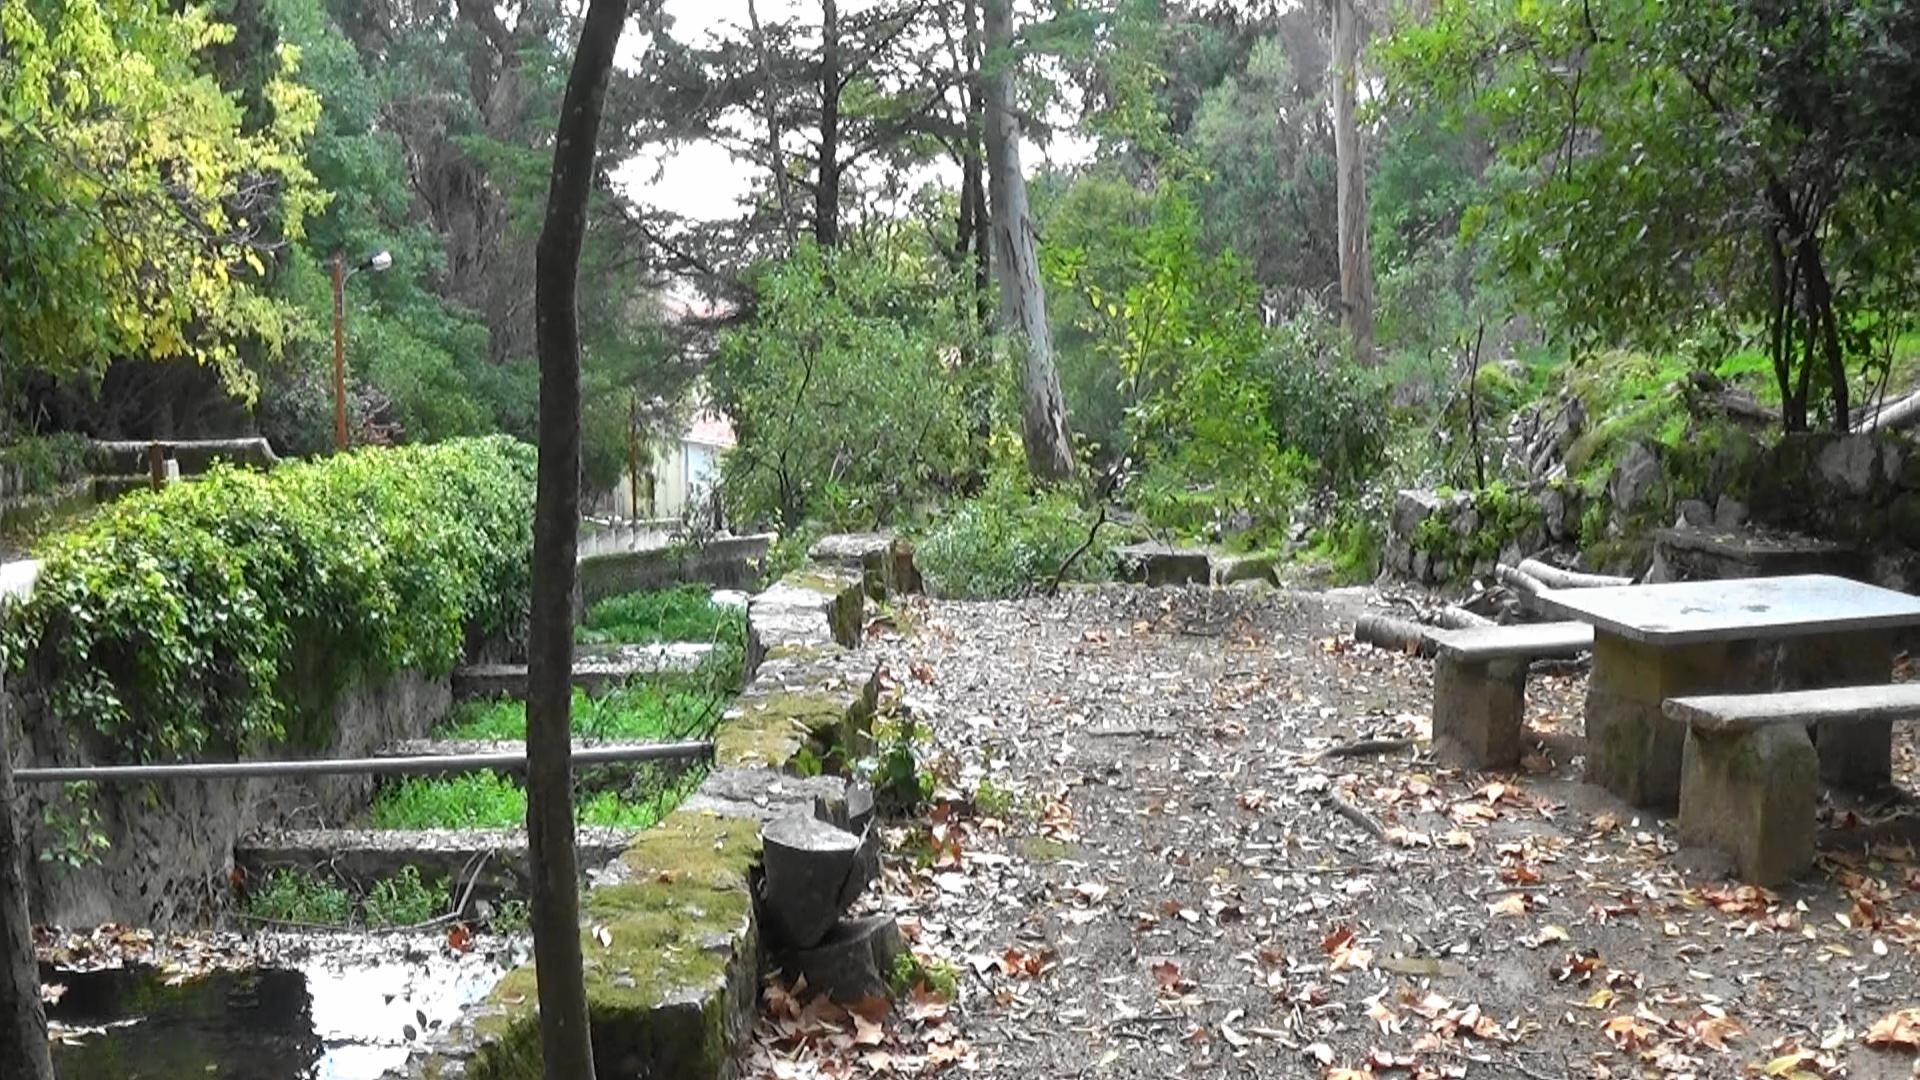 picnic tables made of stone at Cladas de Monchique